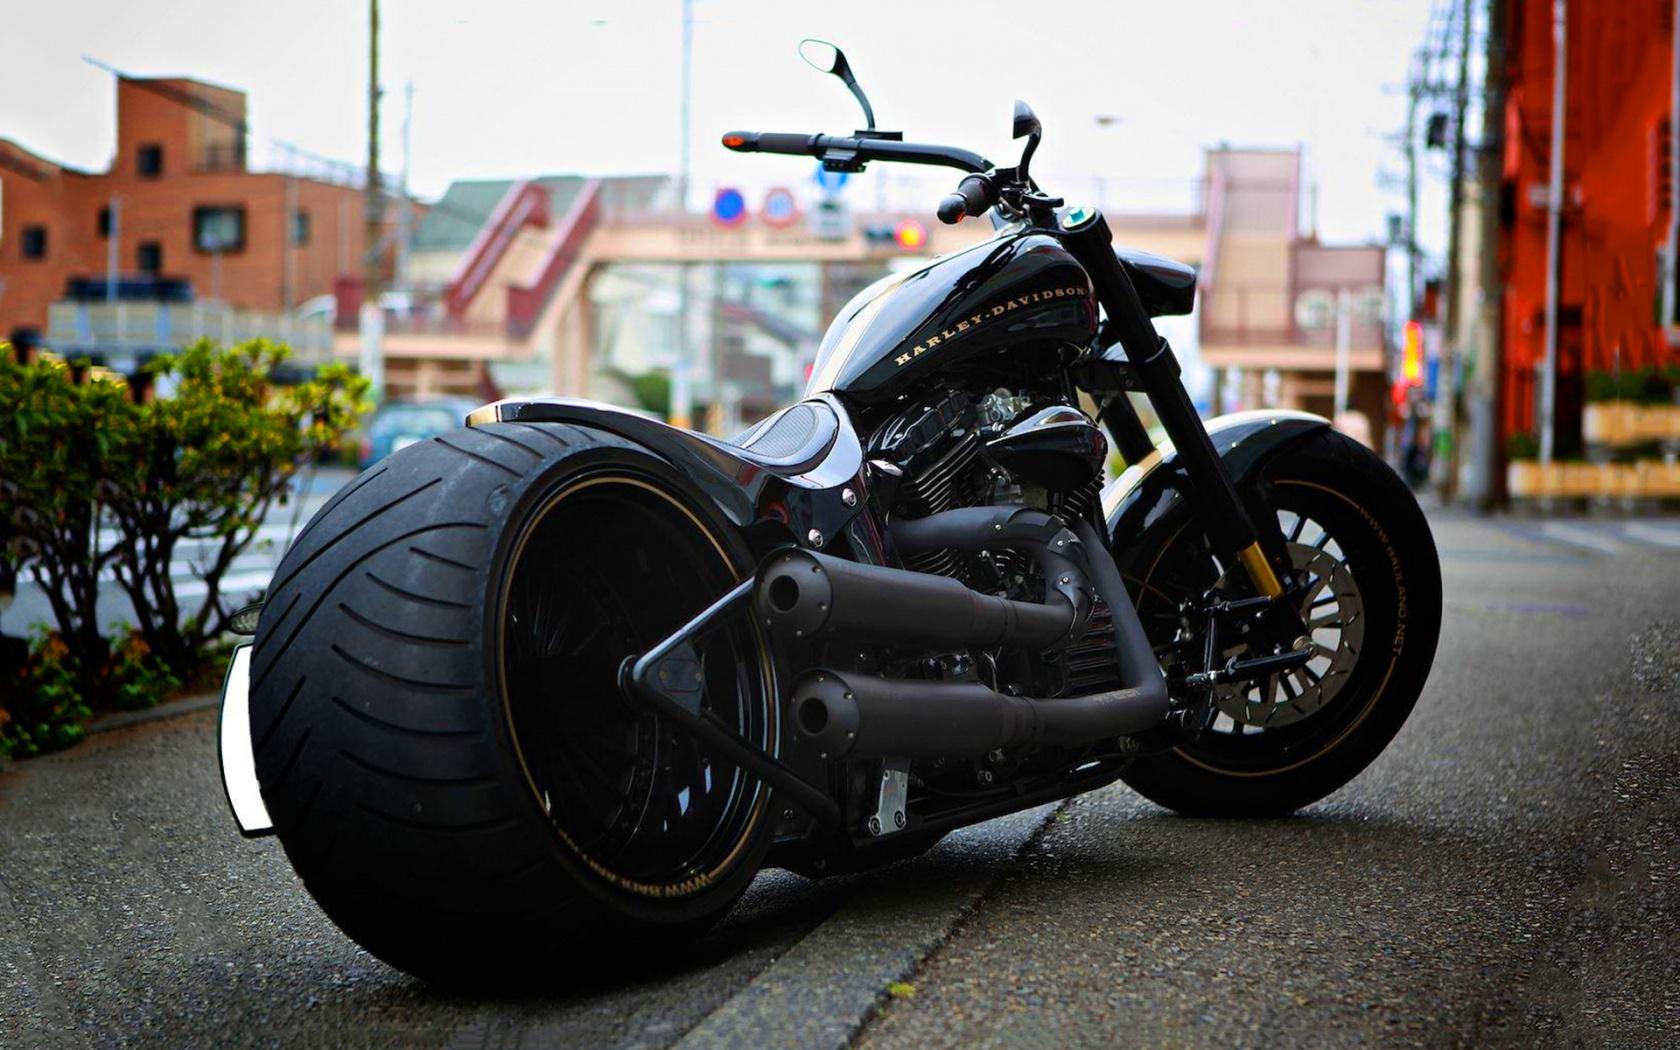 Awesome Harley Davidson Wallpaper